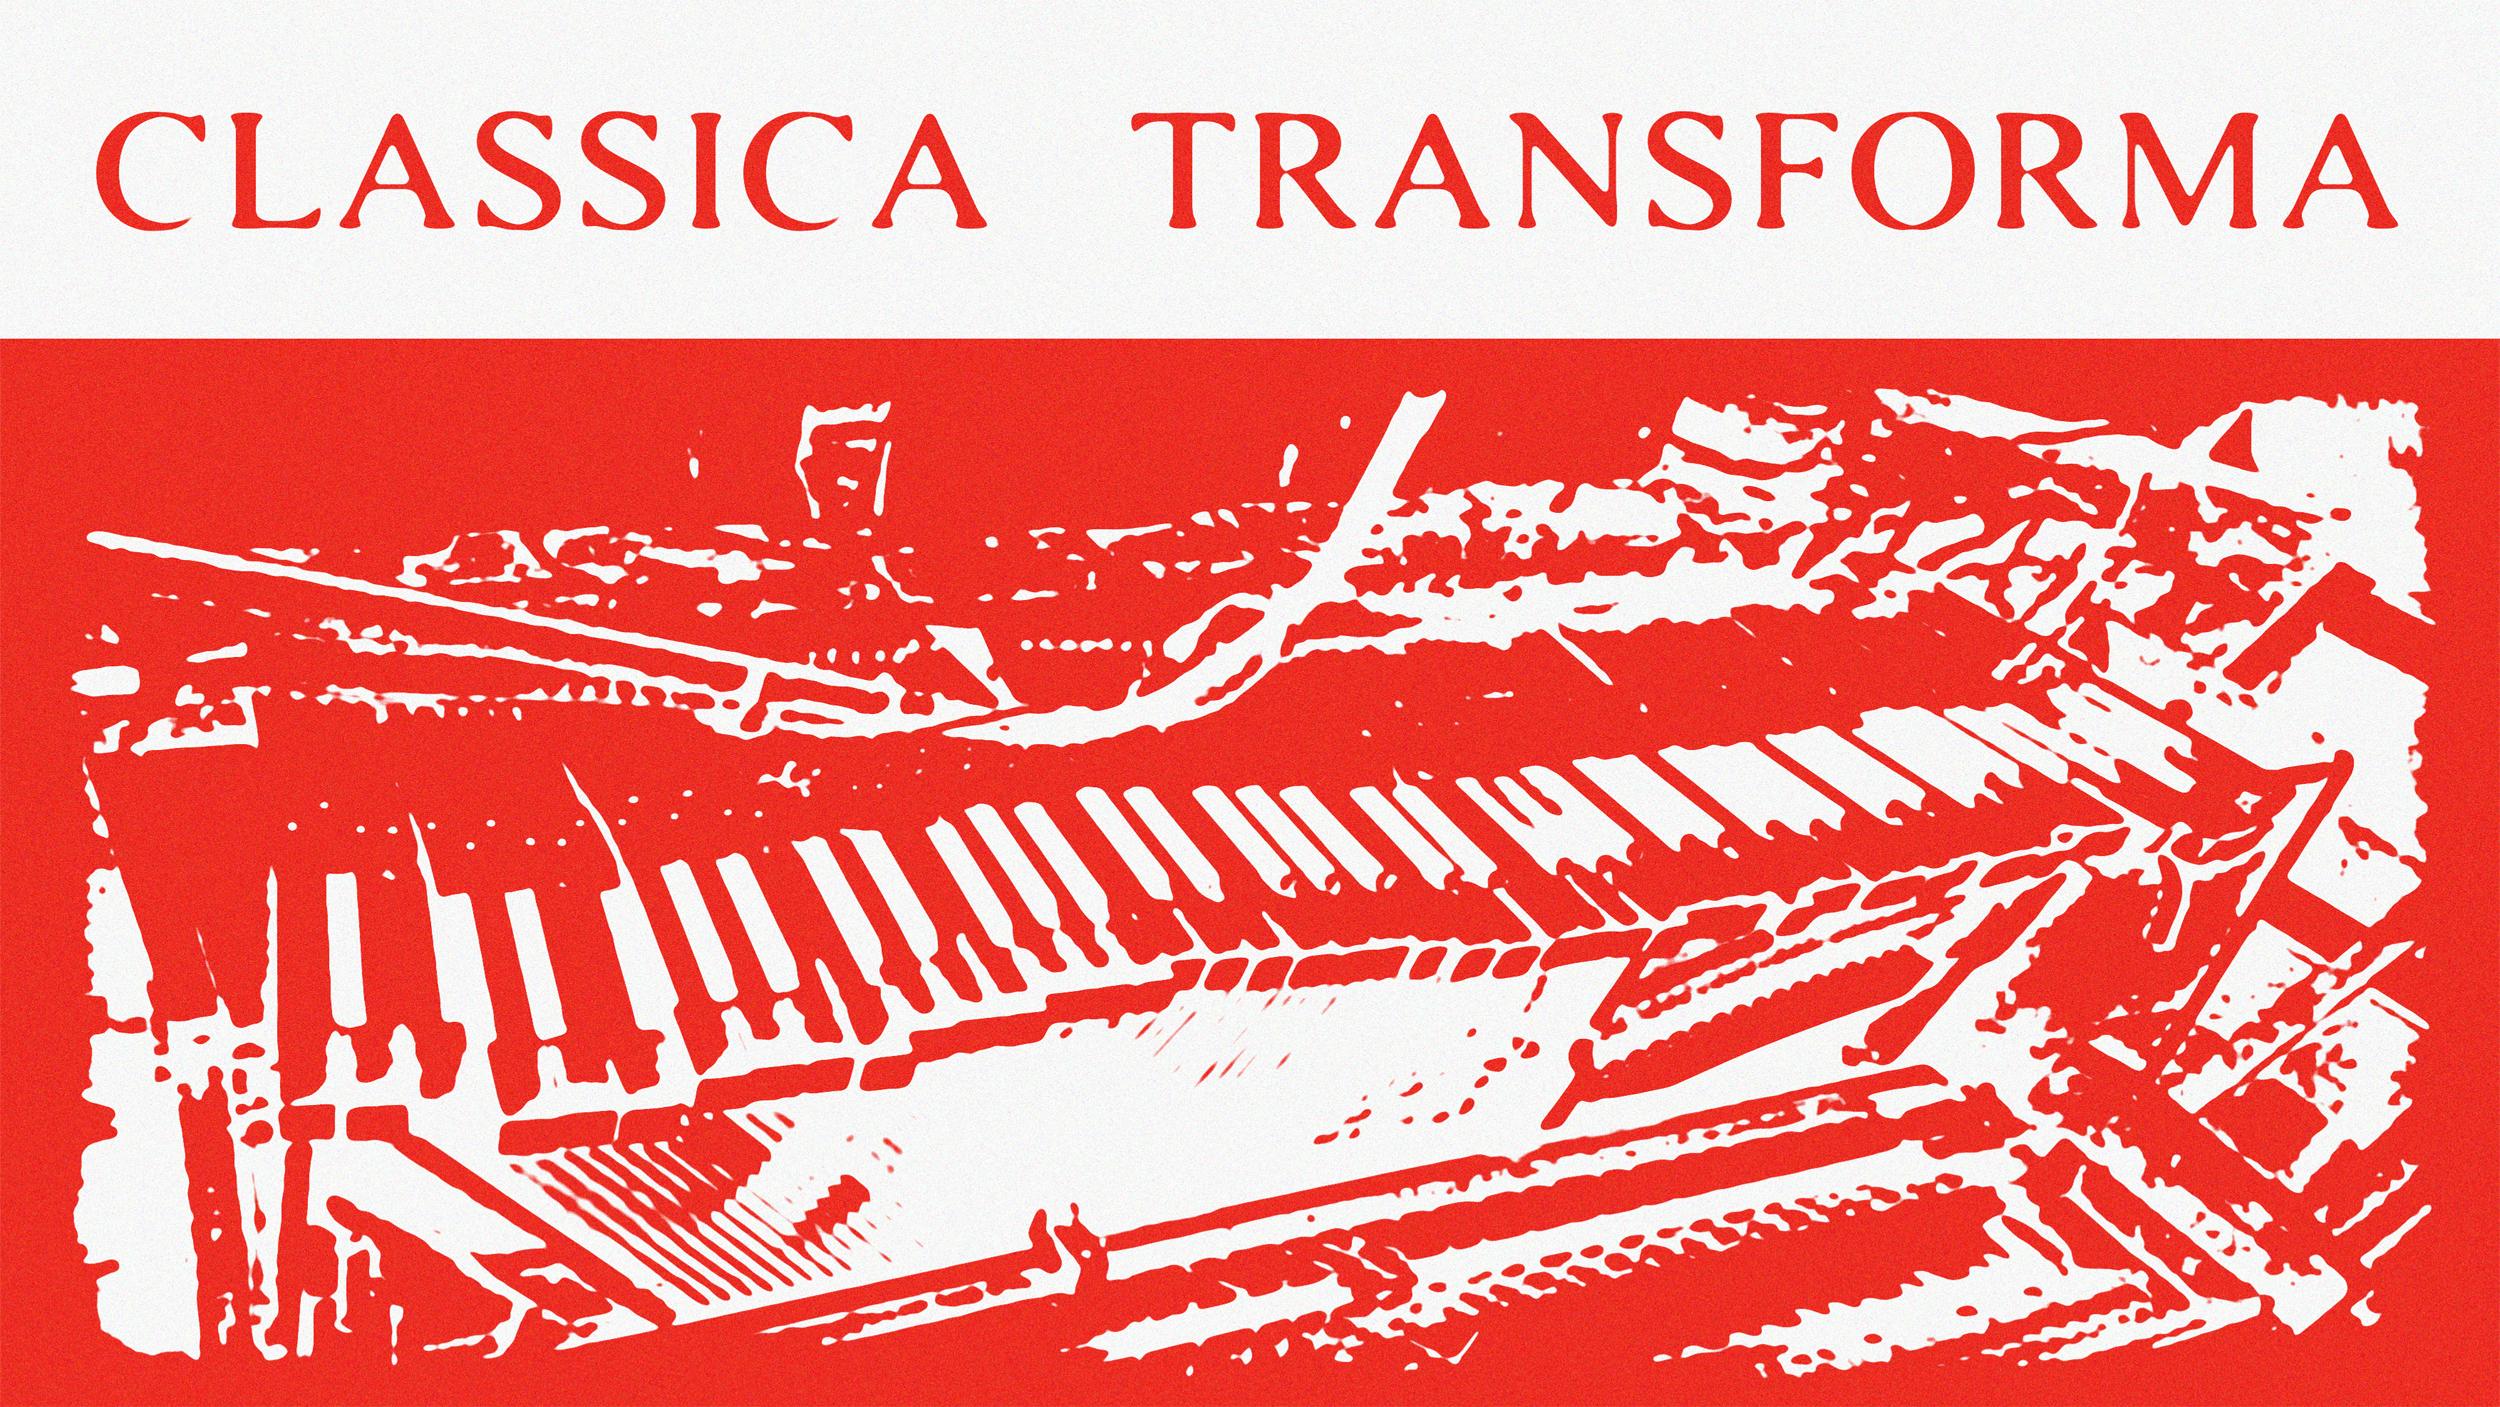 ClassicaTransforma